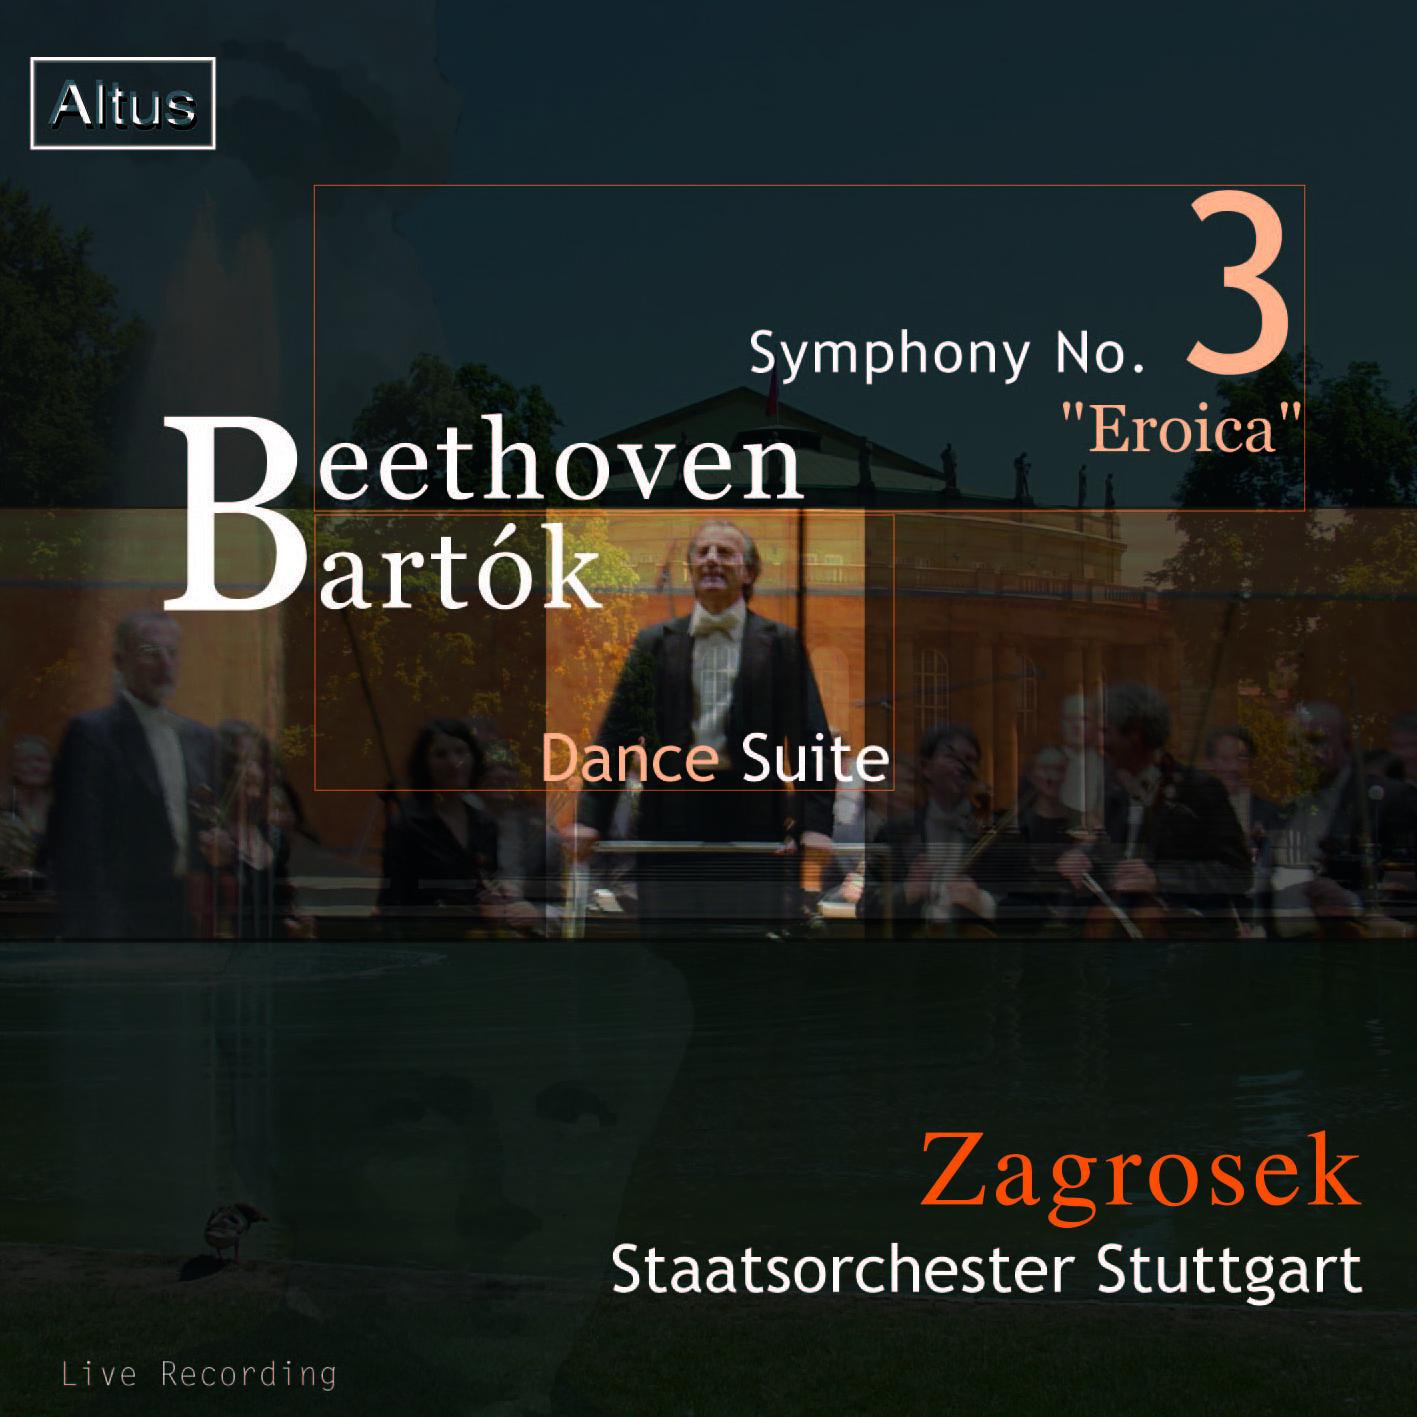 Zagrosek / Staatsorchester Stuttgart - Beethoven : Symphony No.3 etc.